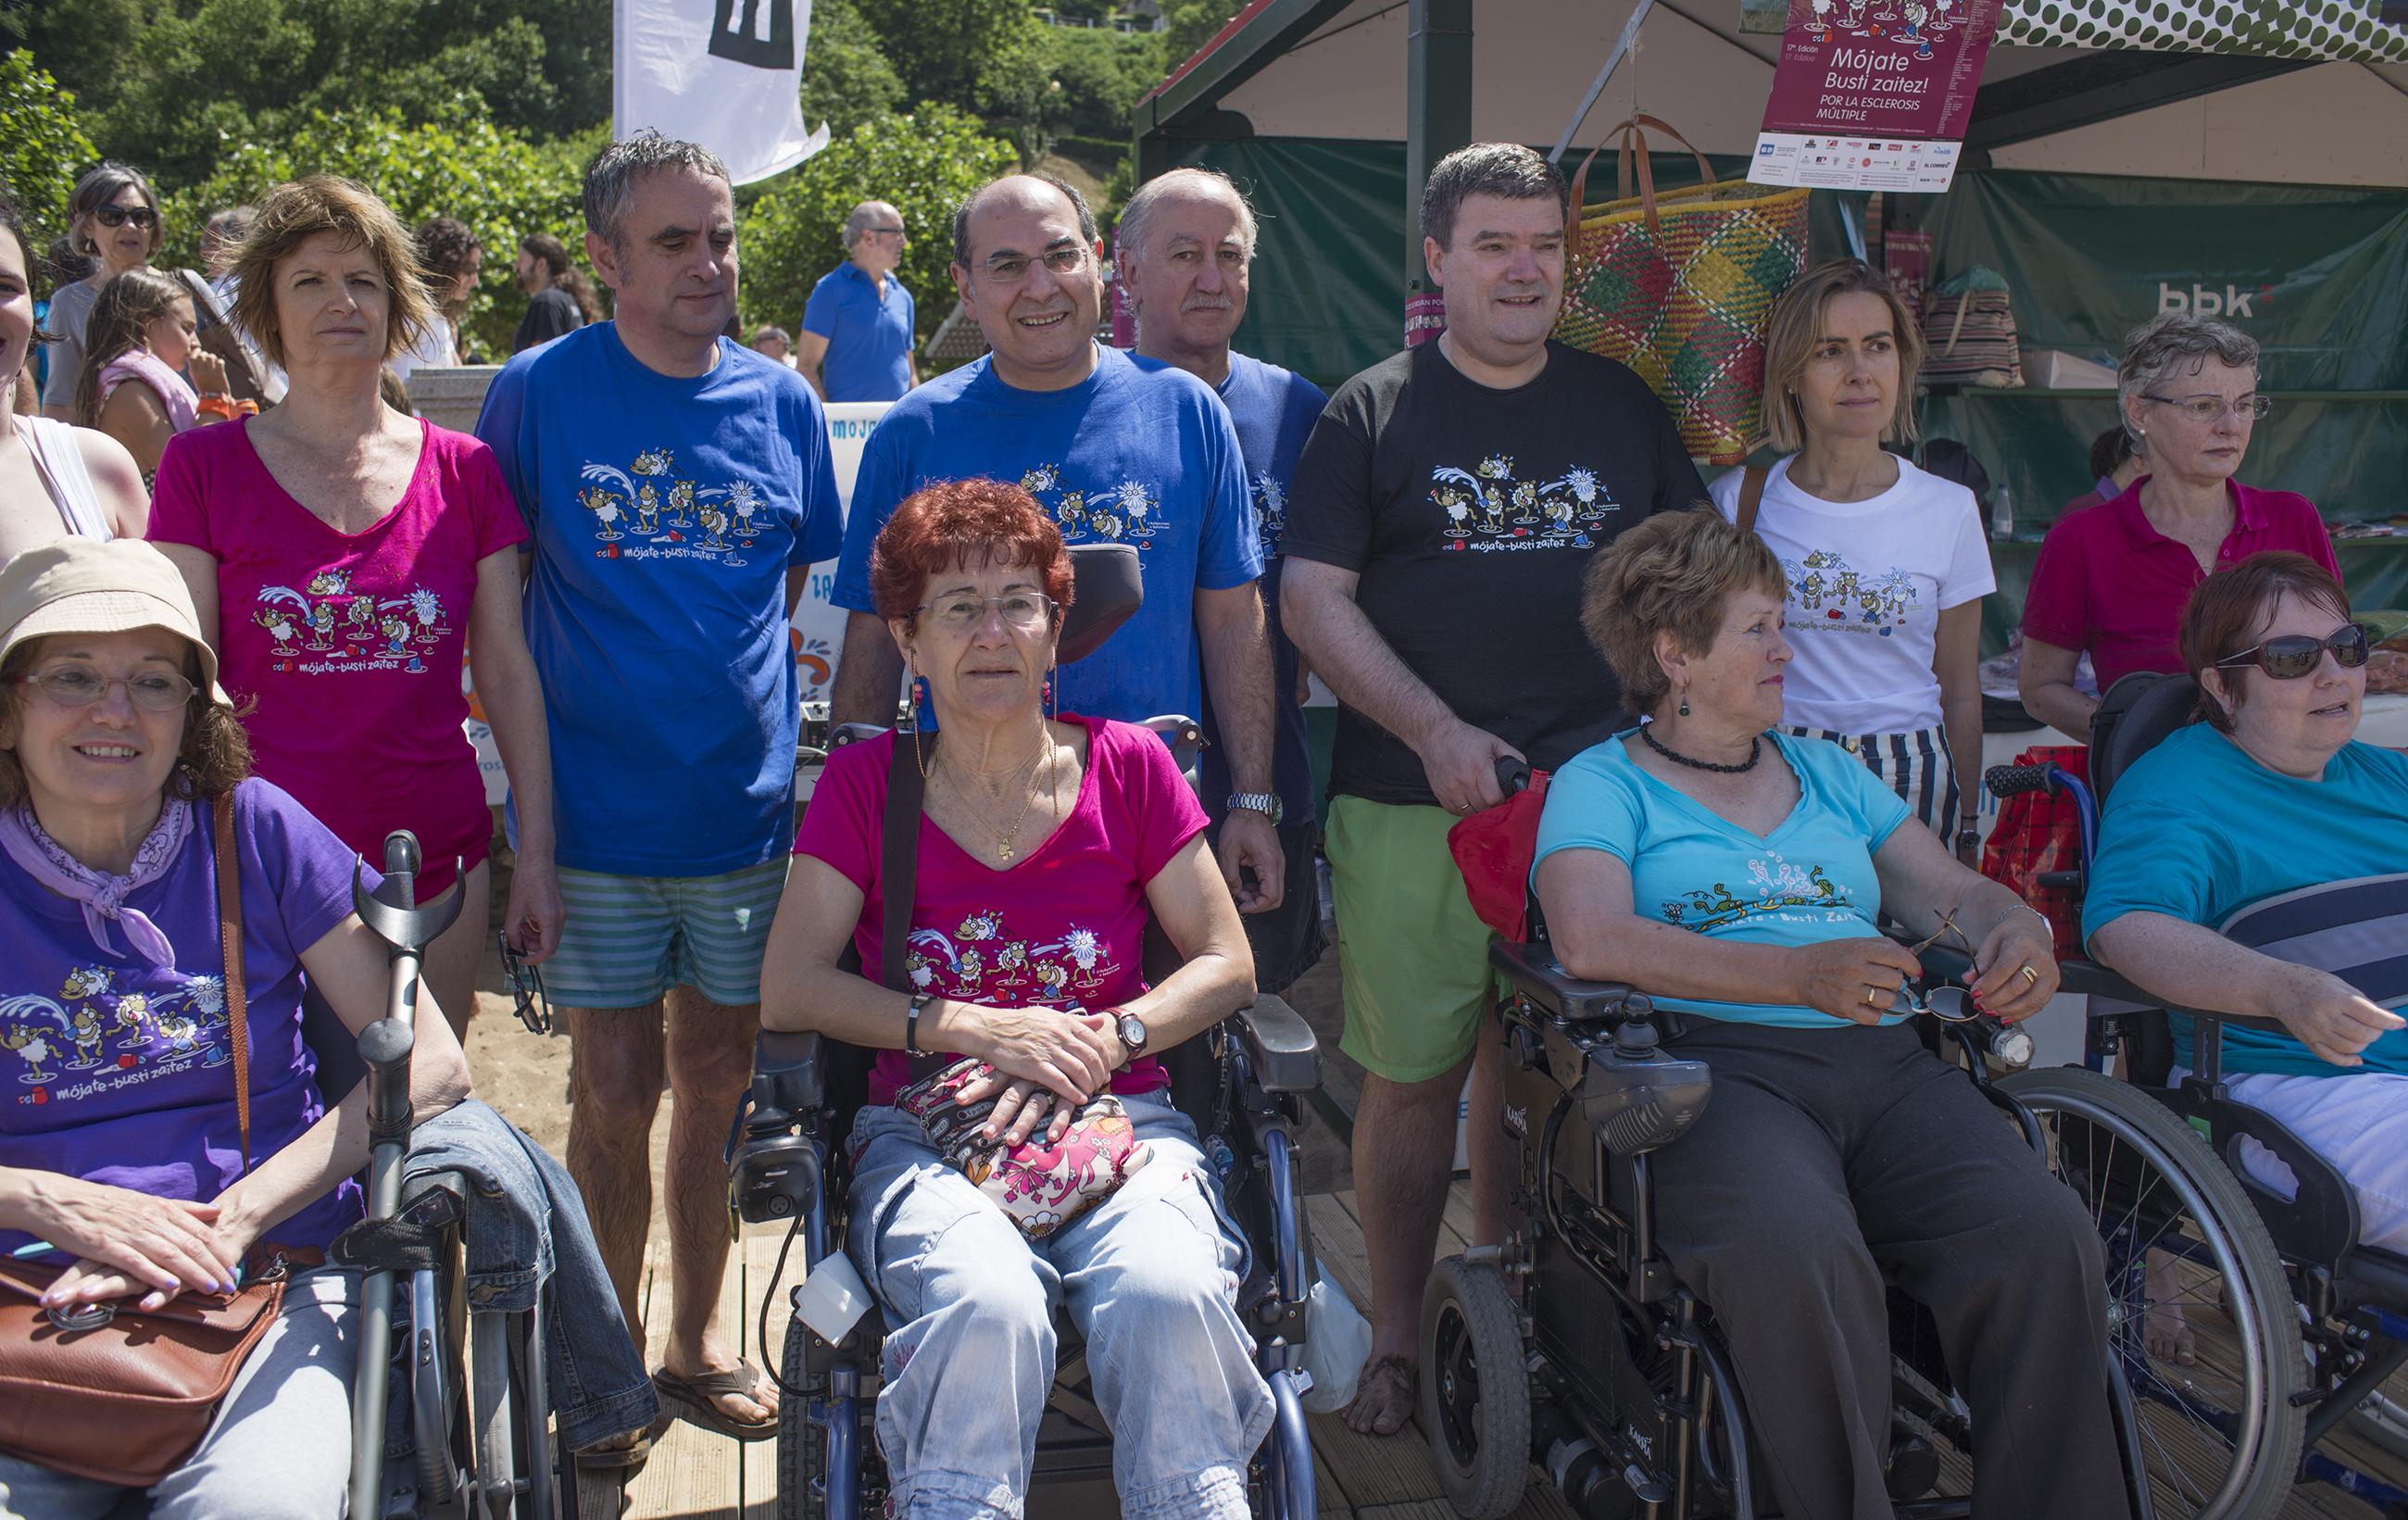 2014_07_13_aburto_darpon_esclerosis_013.jpg